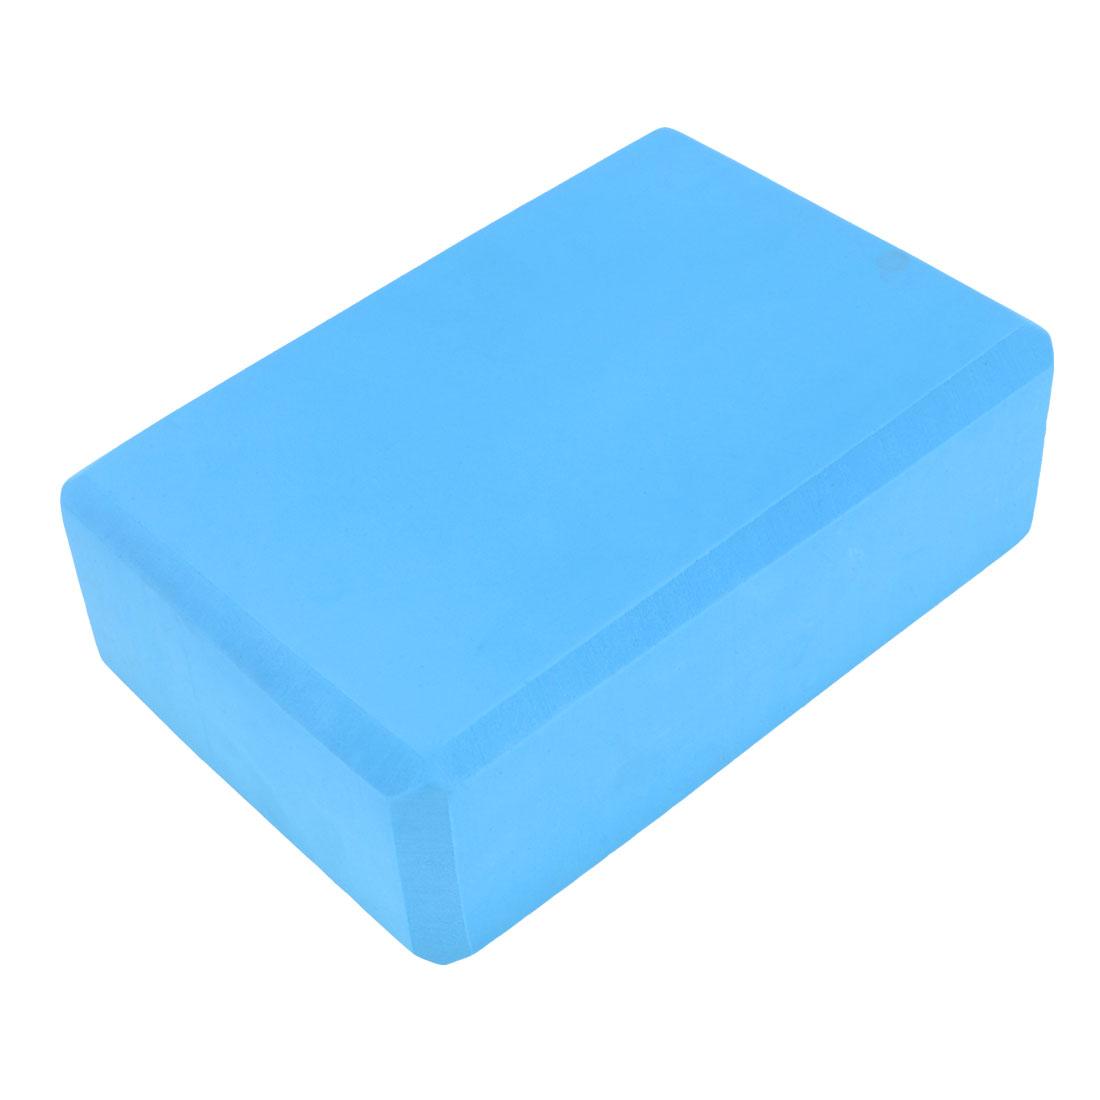 Teal Blue Rectangle Foam Gymnastics Yoga Brick 22.5cm x 15cm x 7.7cm